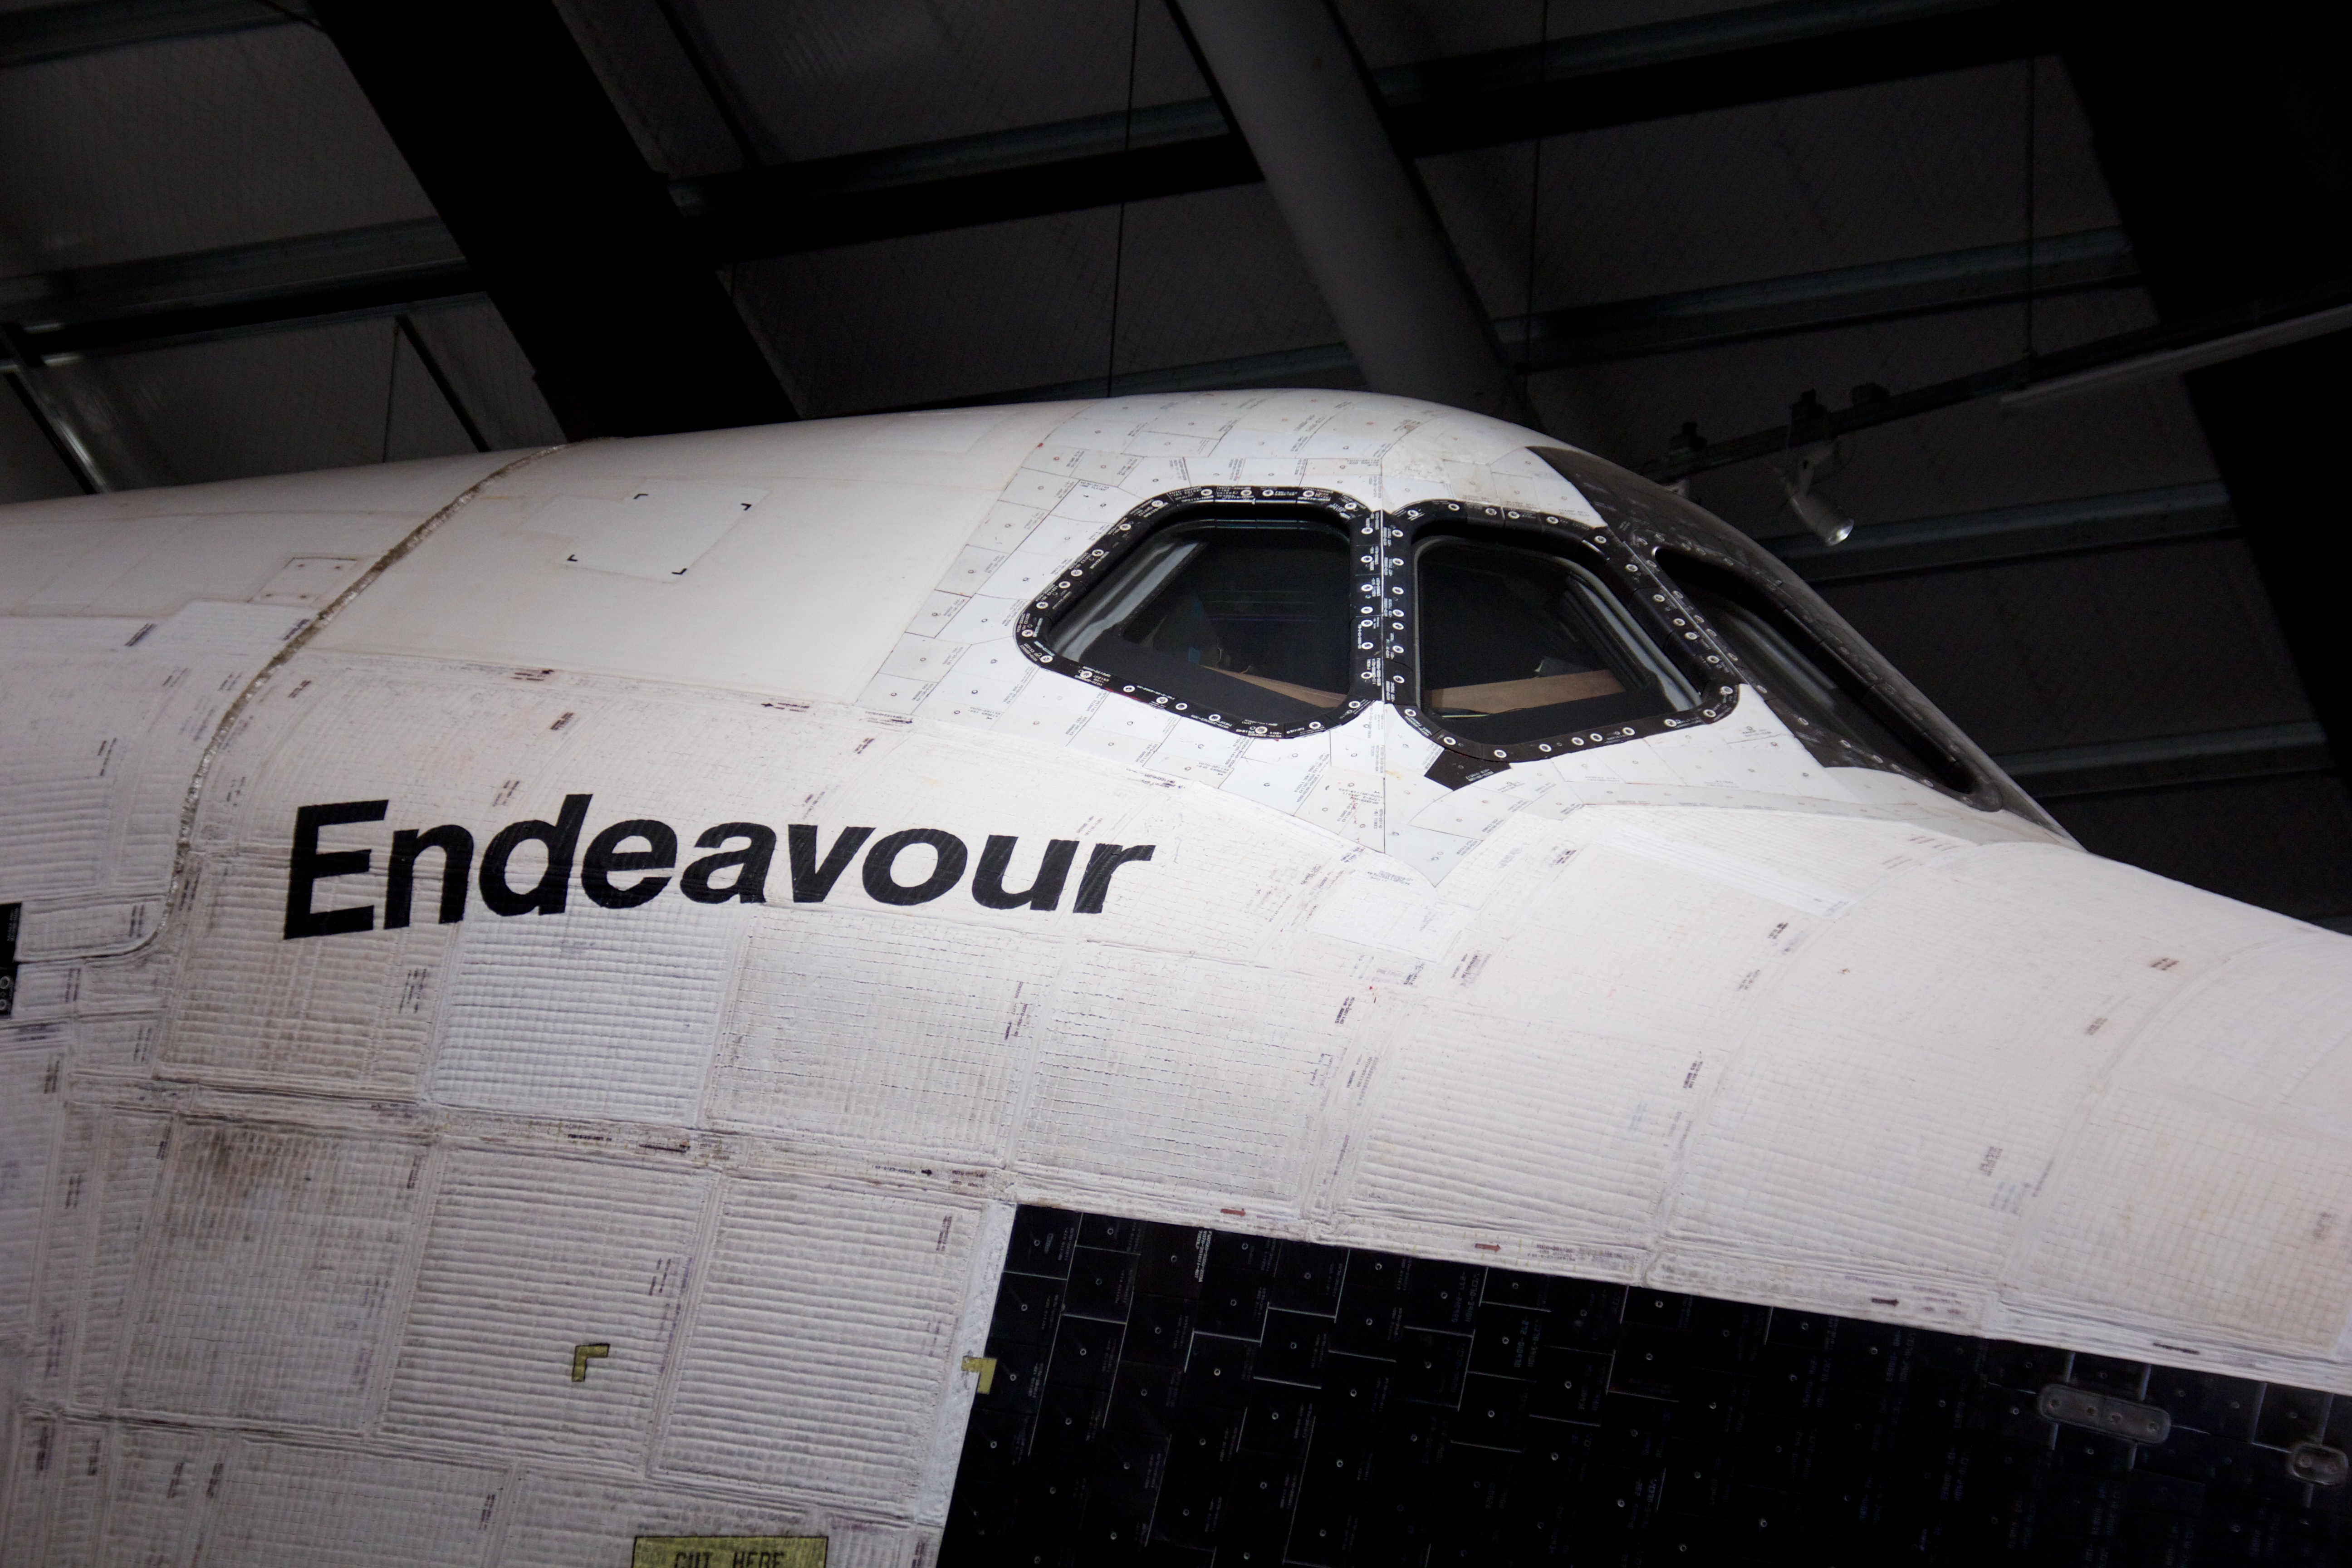 endeavour space shuttle names - photo #3